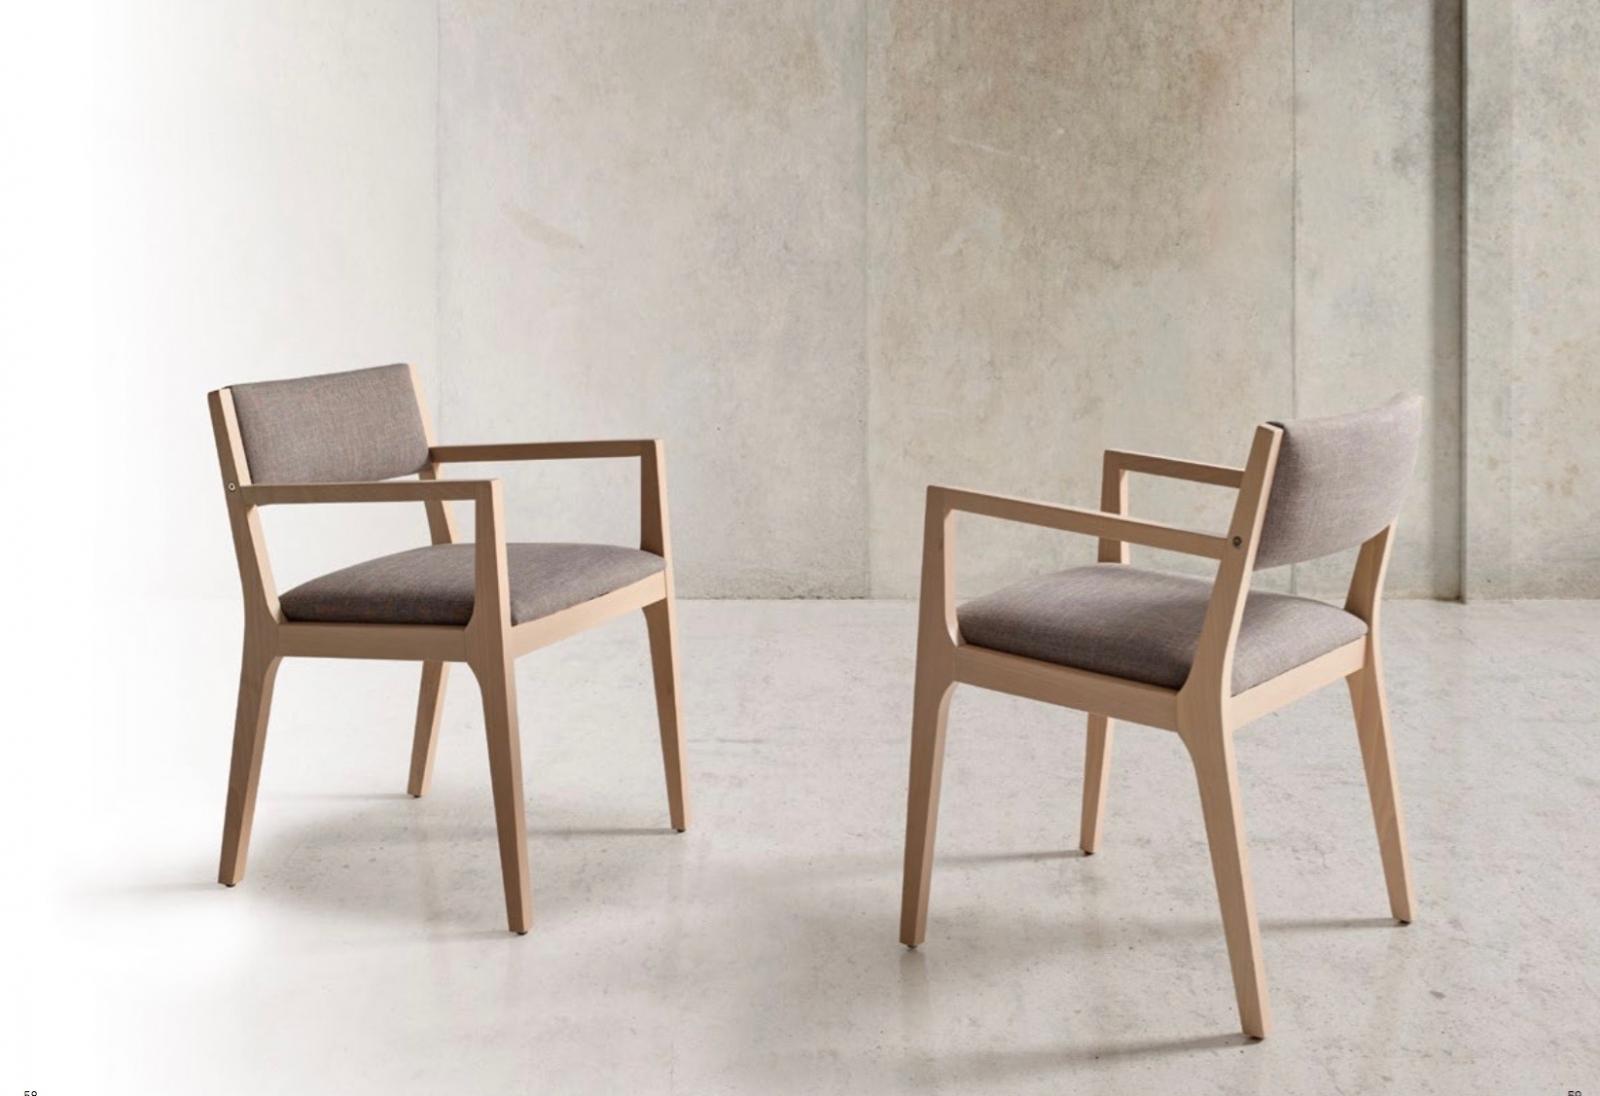 Sillón Inou - Butaca Inou, tapizado de máxima calidad, estructura de madera.